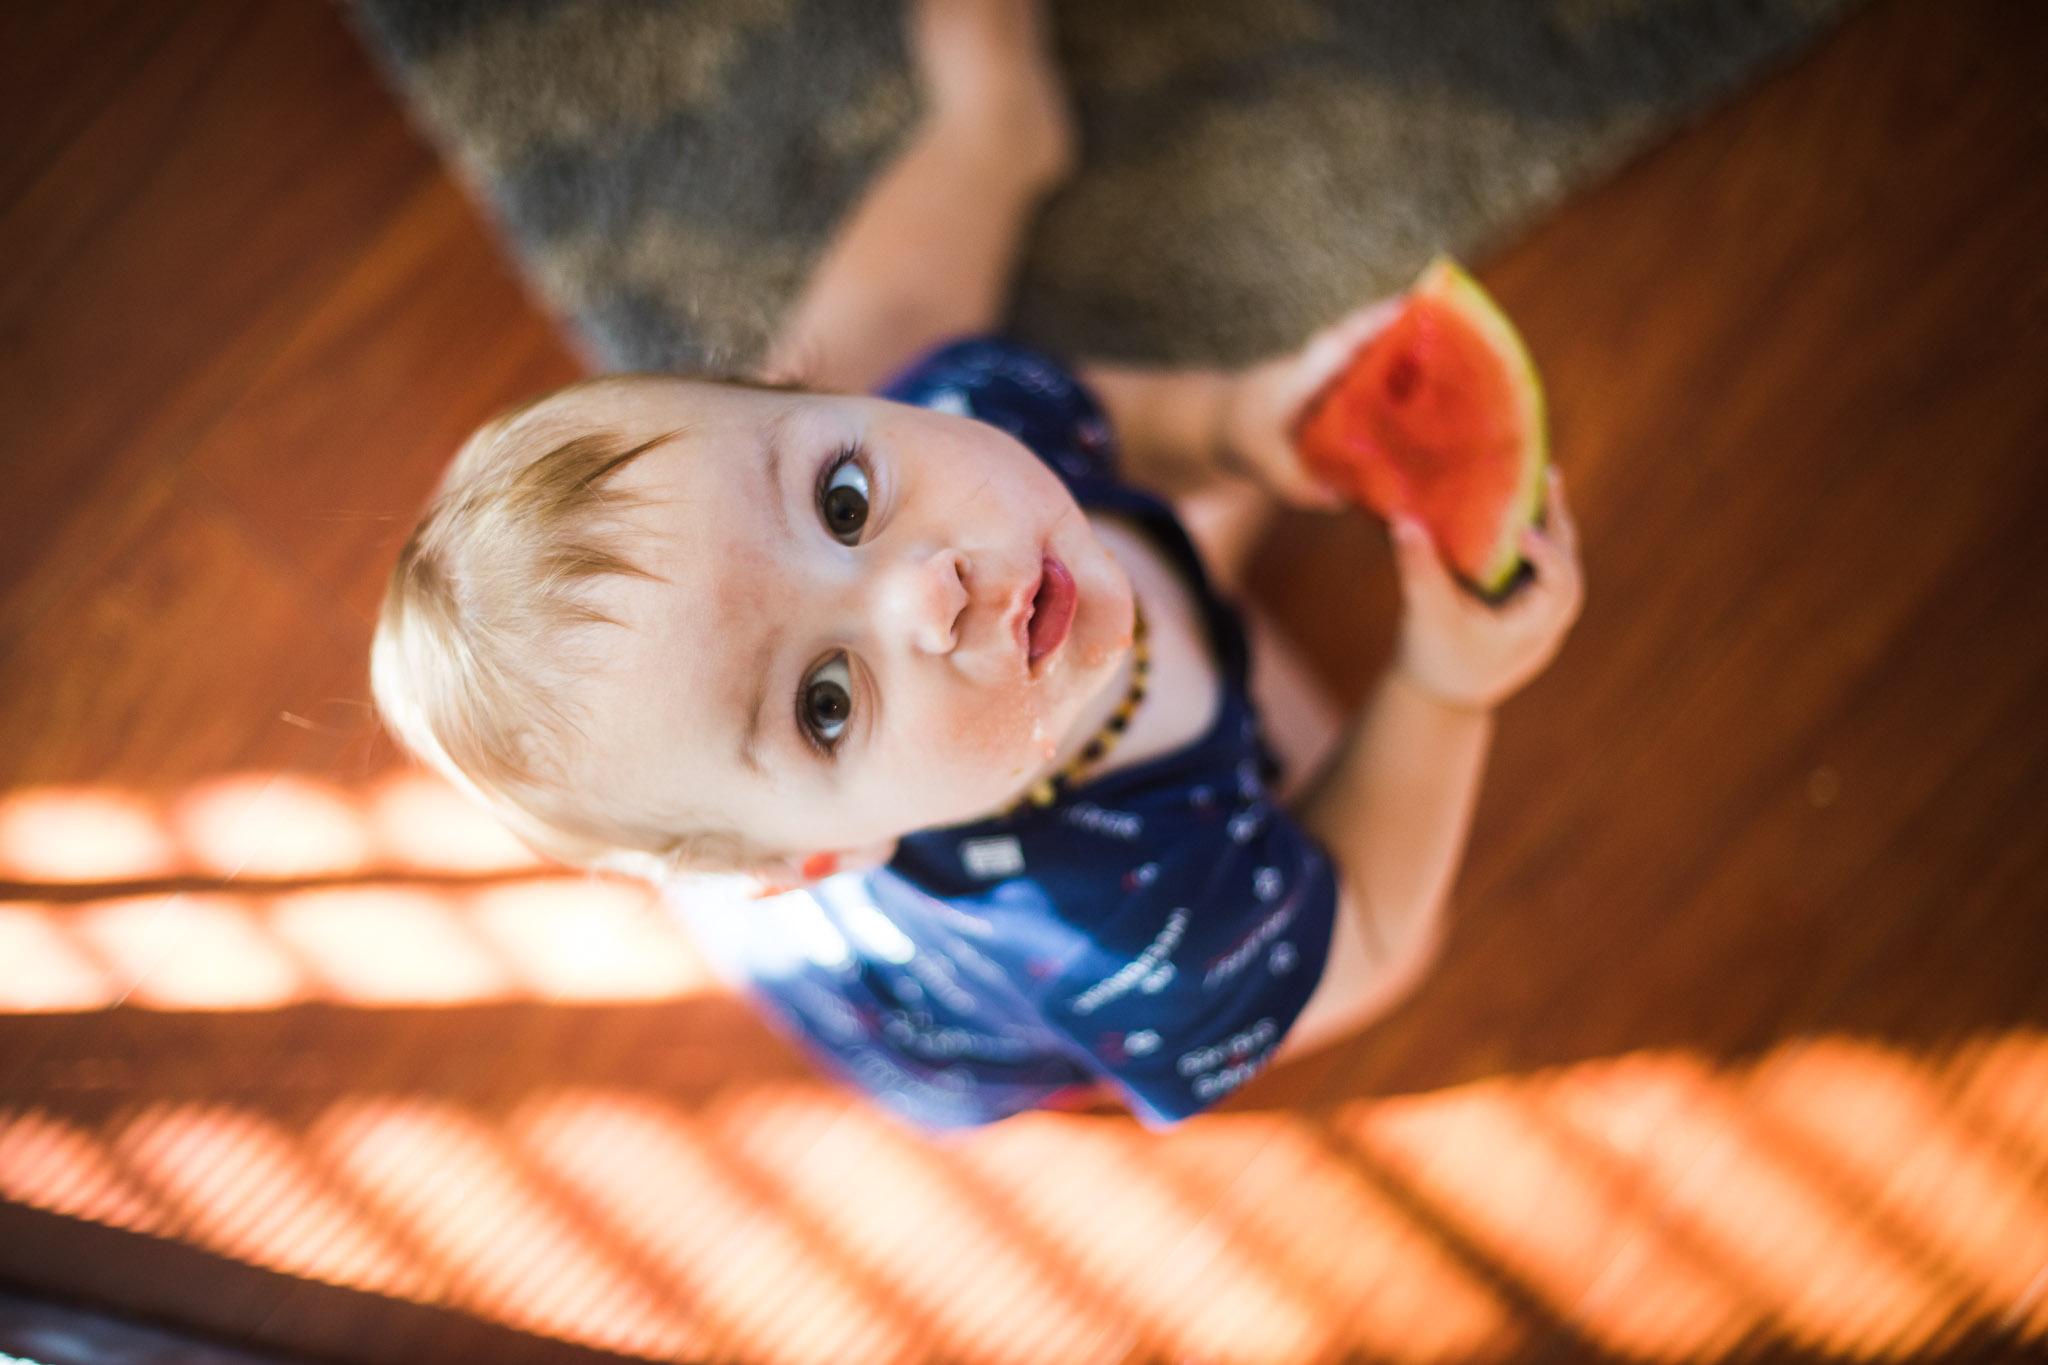 Archer_Inspired_Photography_Watermelon_Baby_Boy_Eating_Lifestyle_Photographer_California-35.jpg